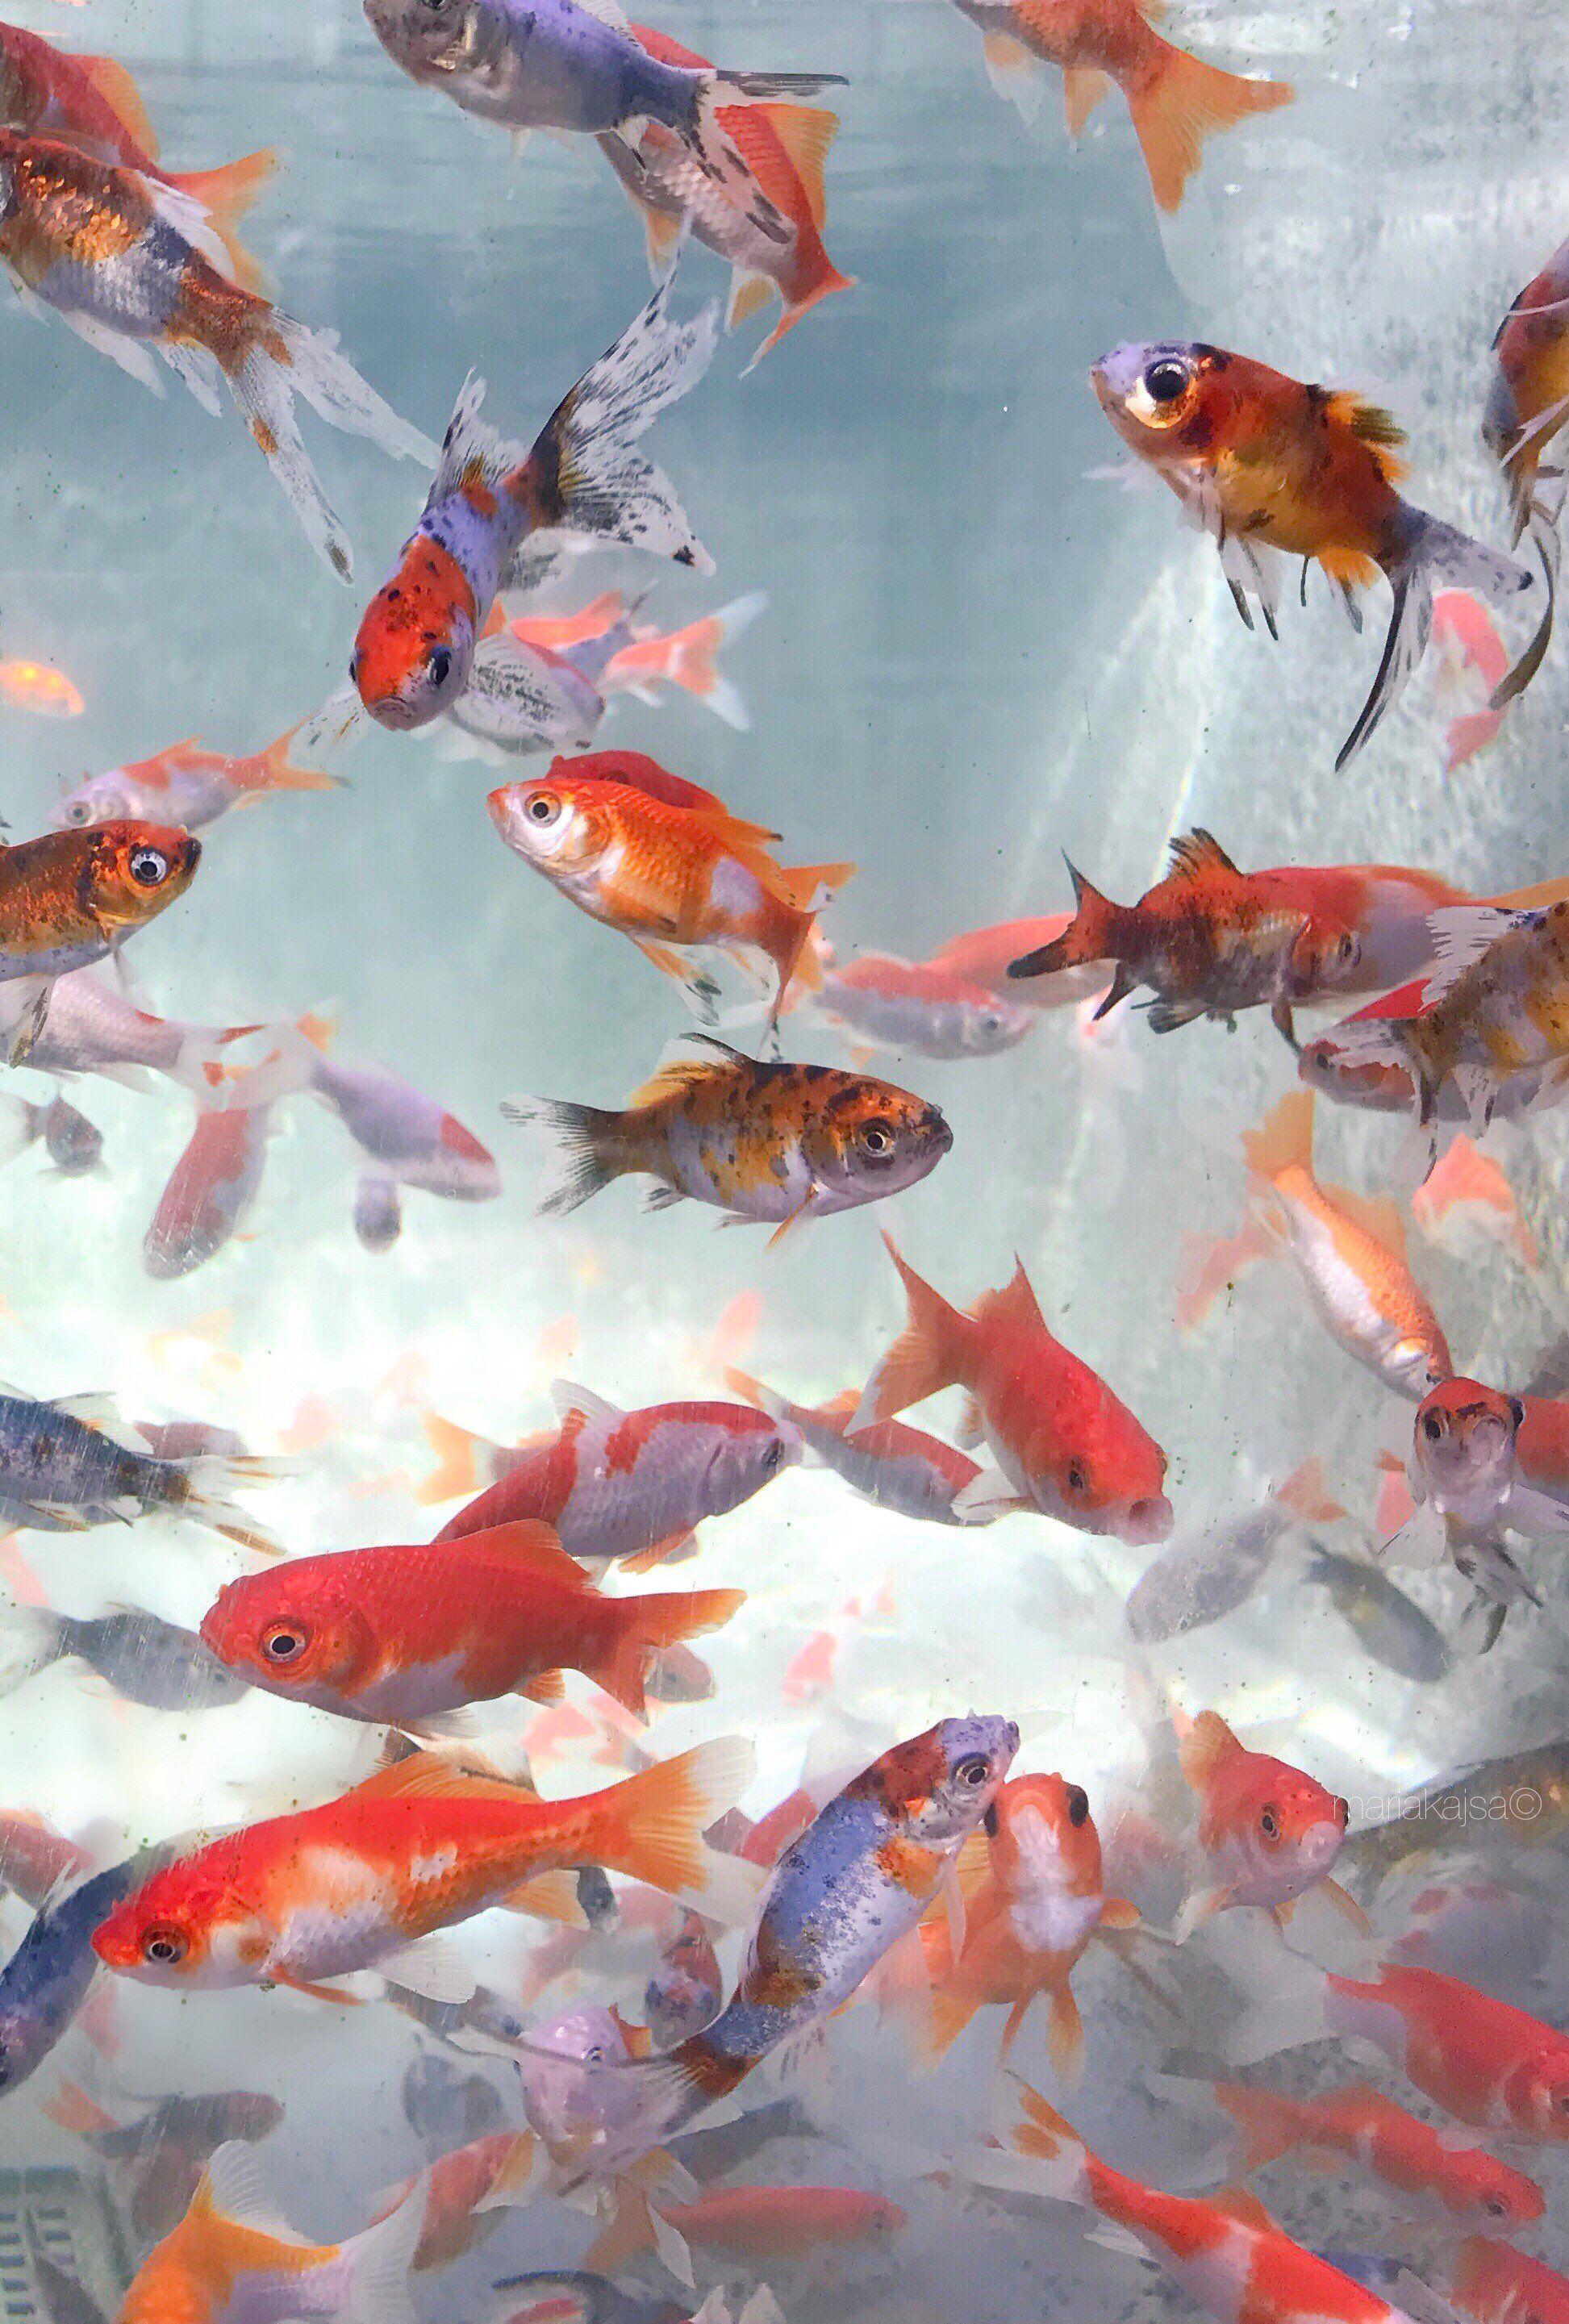 Aquarium Live Wallpaper Free App For Android In 2020 Aquarium Live Wallpaper Aquarium Fish Background